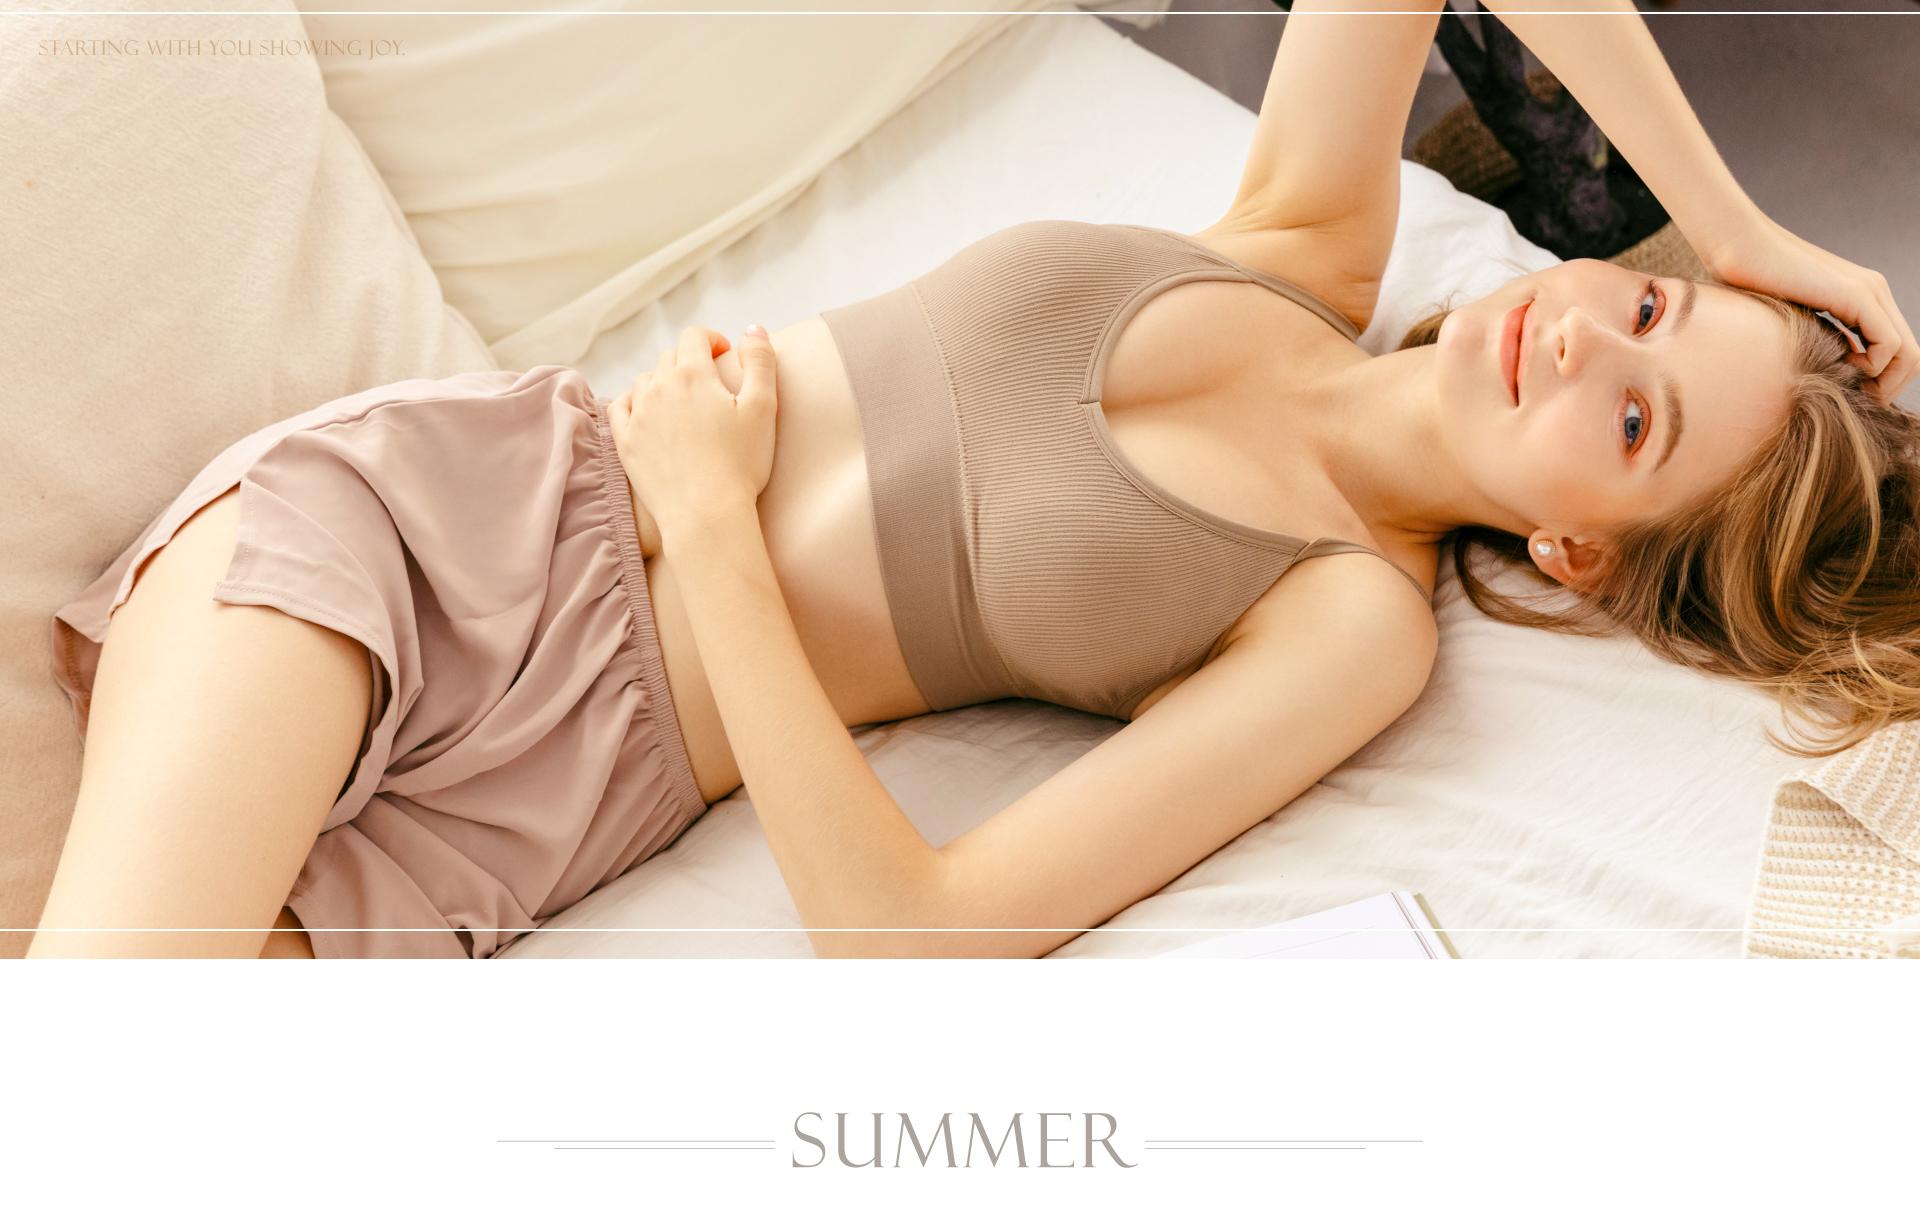 Olivia無鋼圈內衣,舒適,集中,自在的內在美,不論是無痕內衣,蕾絲內衣,性感內衣,少女內衣,都在OLIVIA無鋼圈內衣,穿搭有型的小可愛,背心,睡衣或配件,Olivia期待讓你身體感受零束縛與自由自在的舒適。